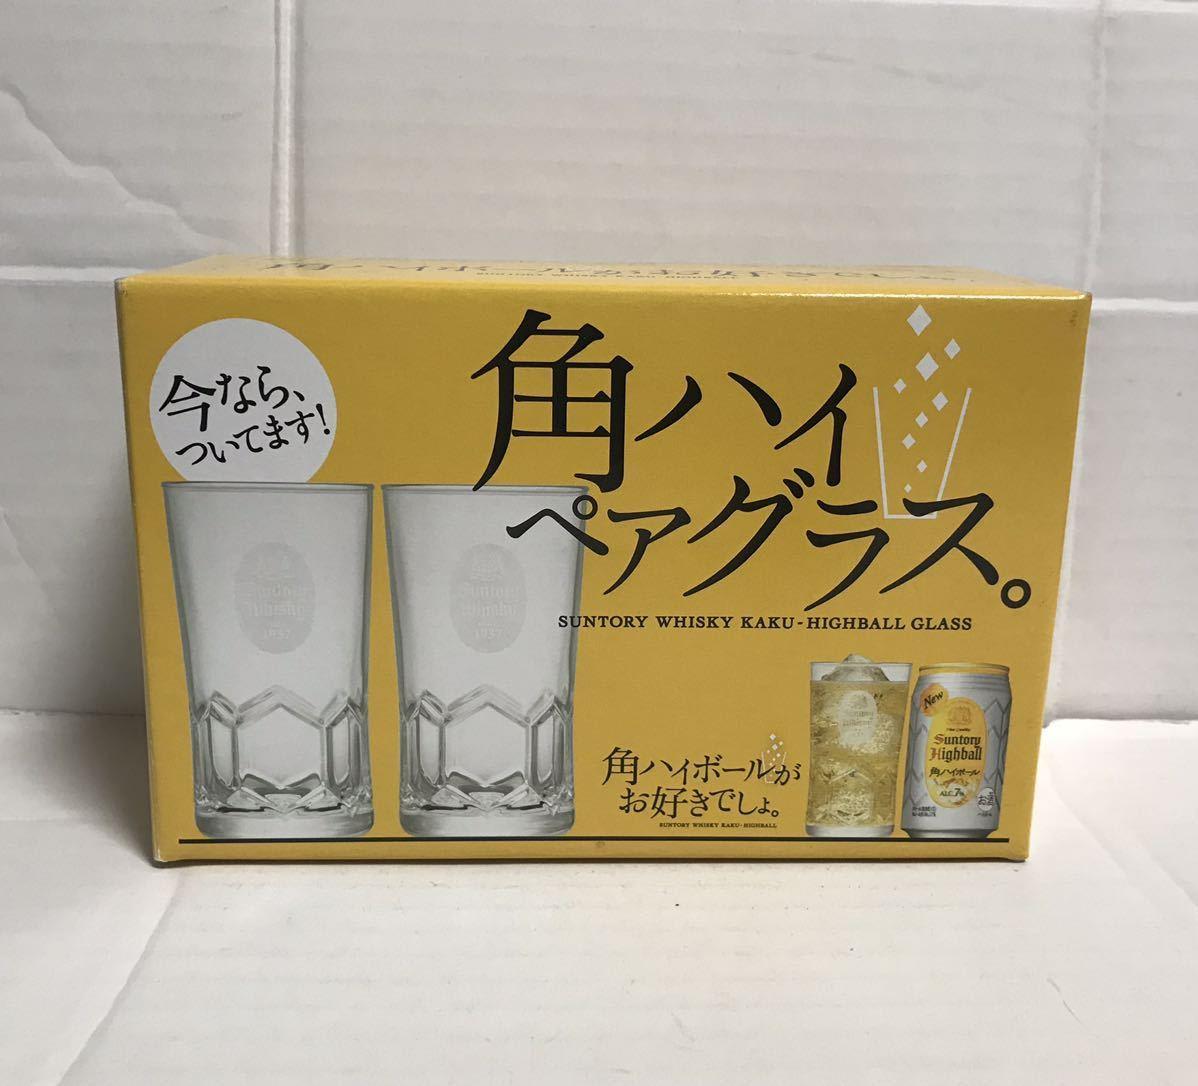 SUNTORY WHISKY サントリー ウイスキー 角ハイ ペアグラス グラス 2個セット 箱付き 250ml 日本製_画像1